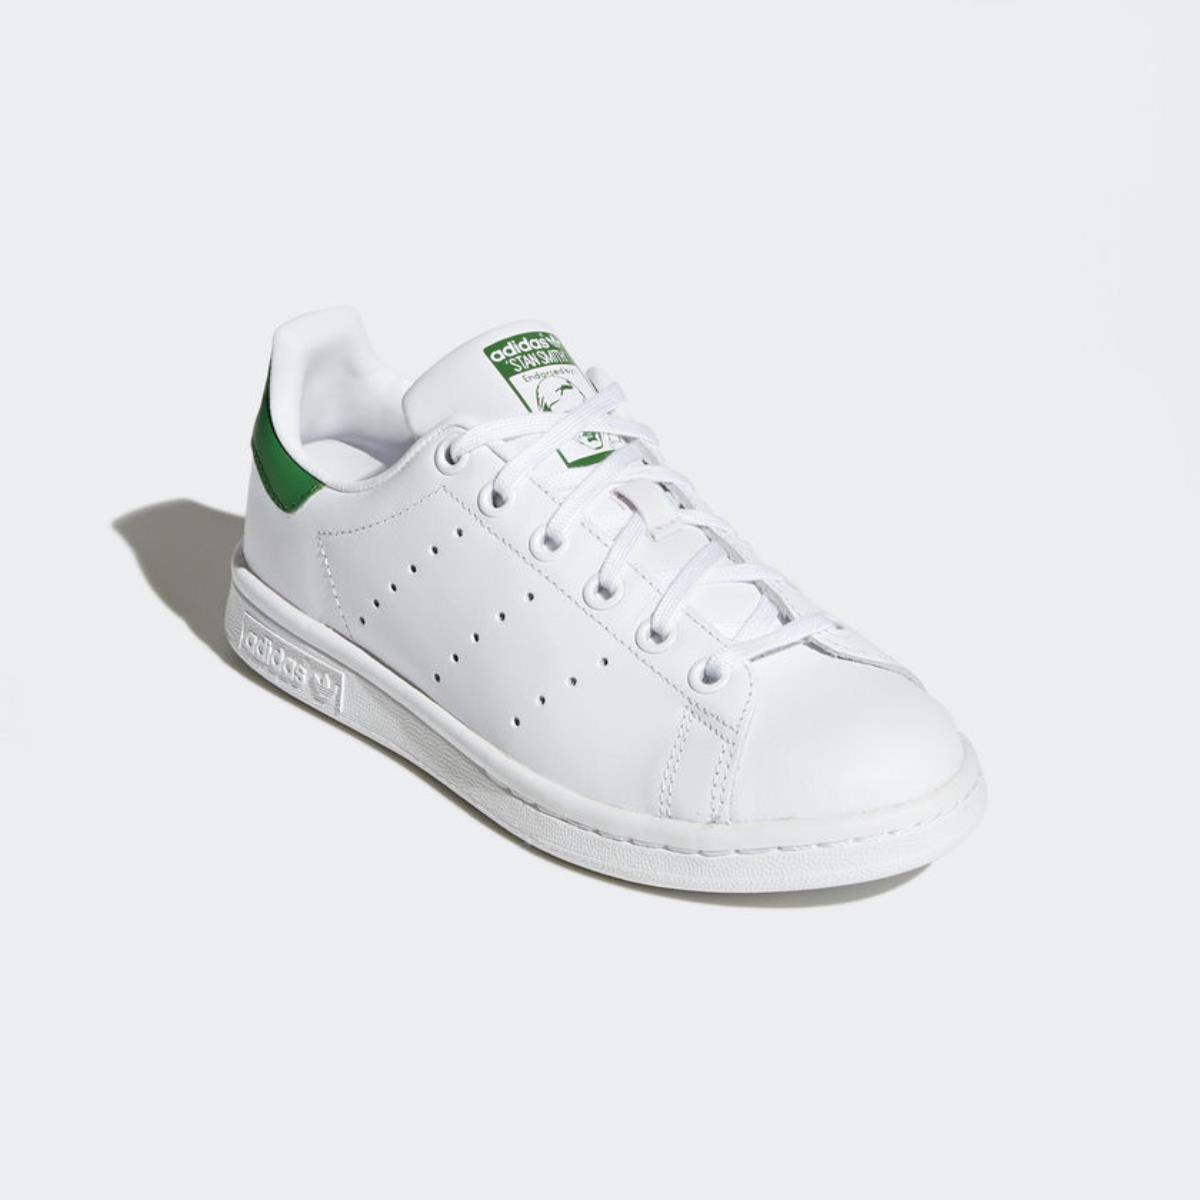 f3f1c43a4d5a5d adidas stan smith j bianco verde m20605